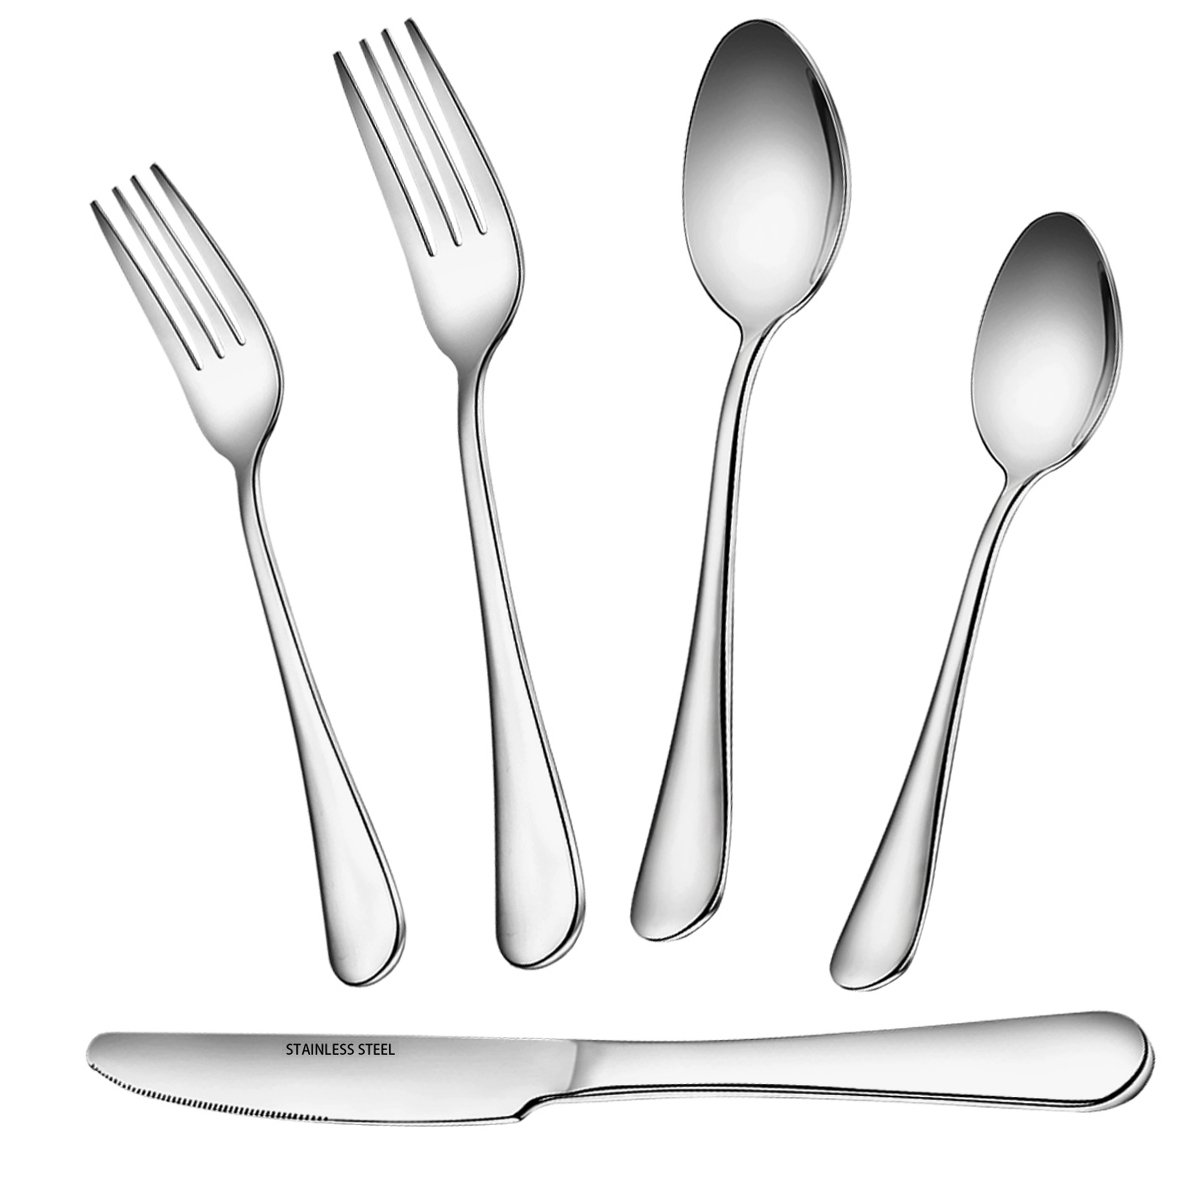 Flatware Set, 5 Piece Stainless Steel Silverware Set, Umite Chef Kitchen Hotel Restaurant Tableware Cutlery Set, Include 2 Fork/2 Spoon/Knive, Mirror Finished, Dishwasher Safe